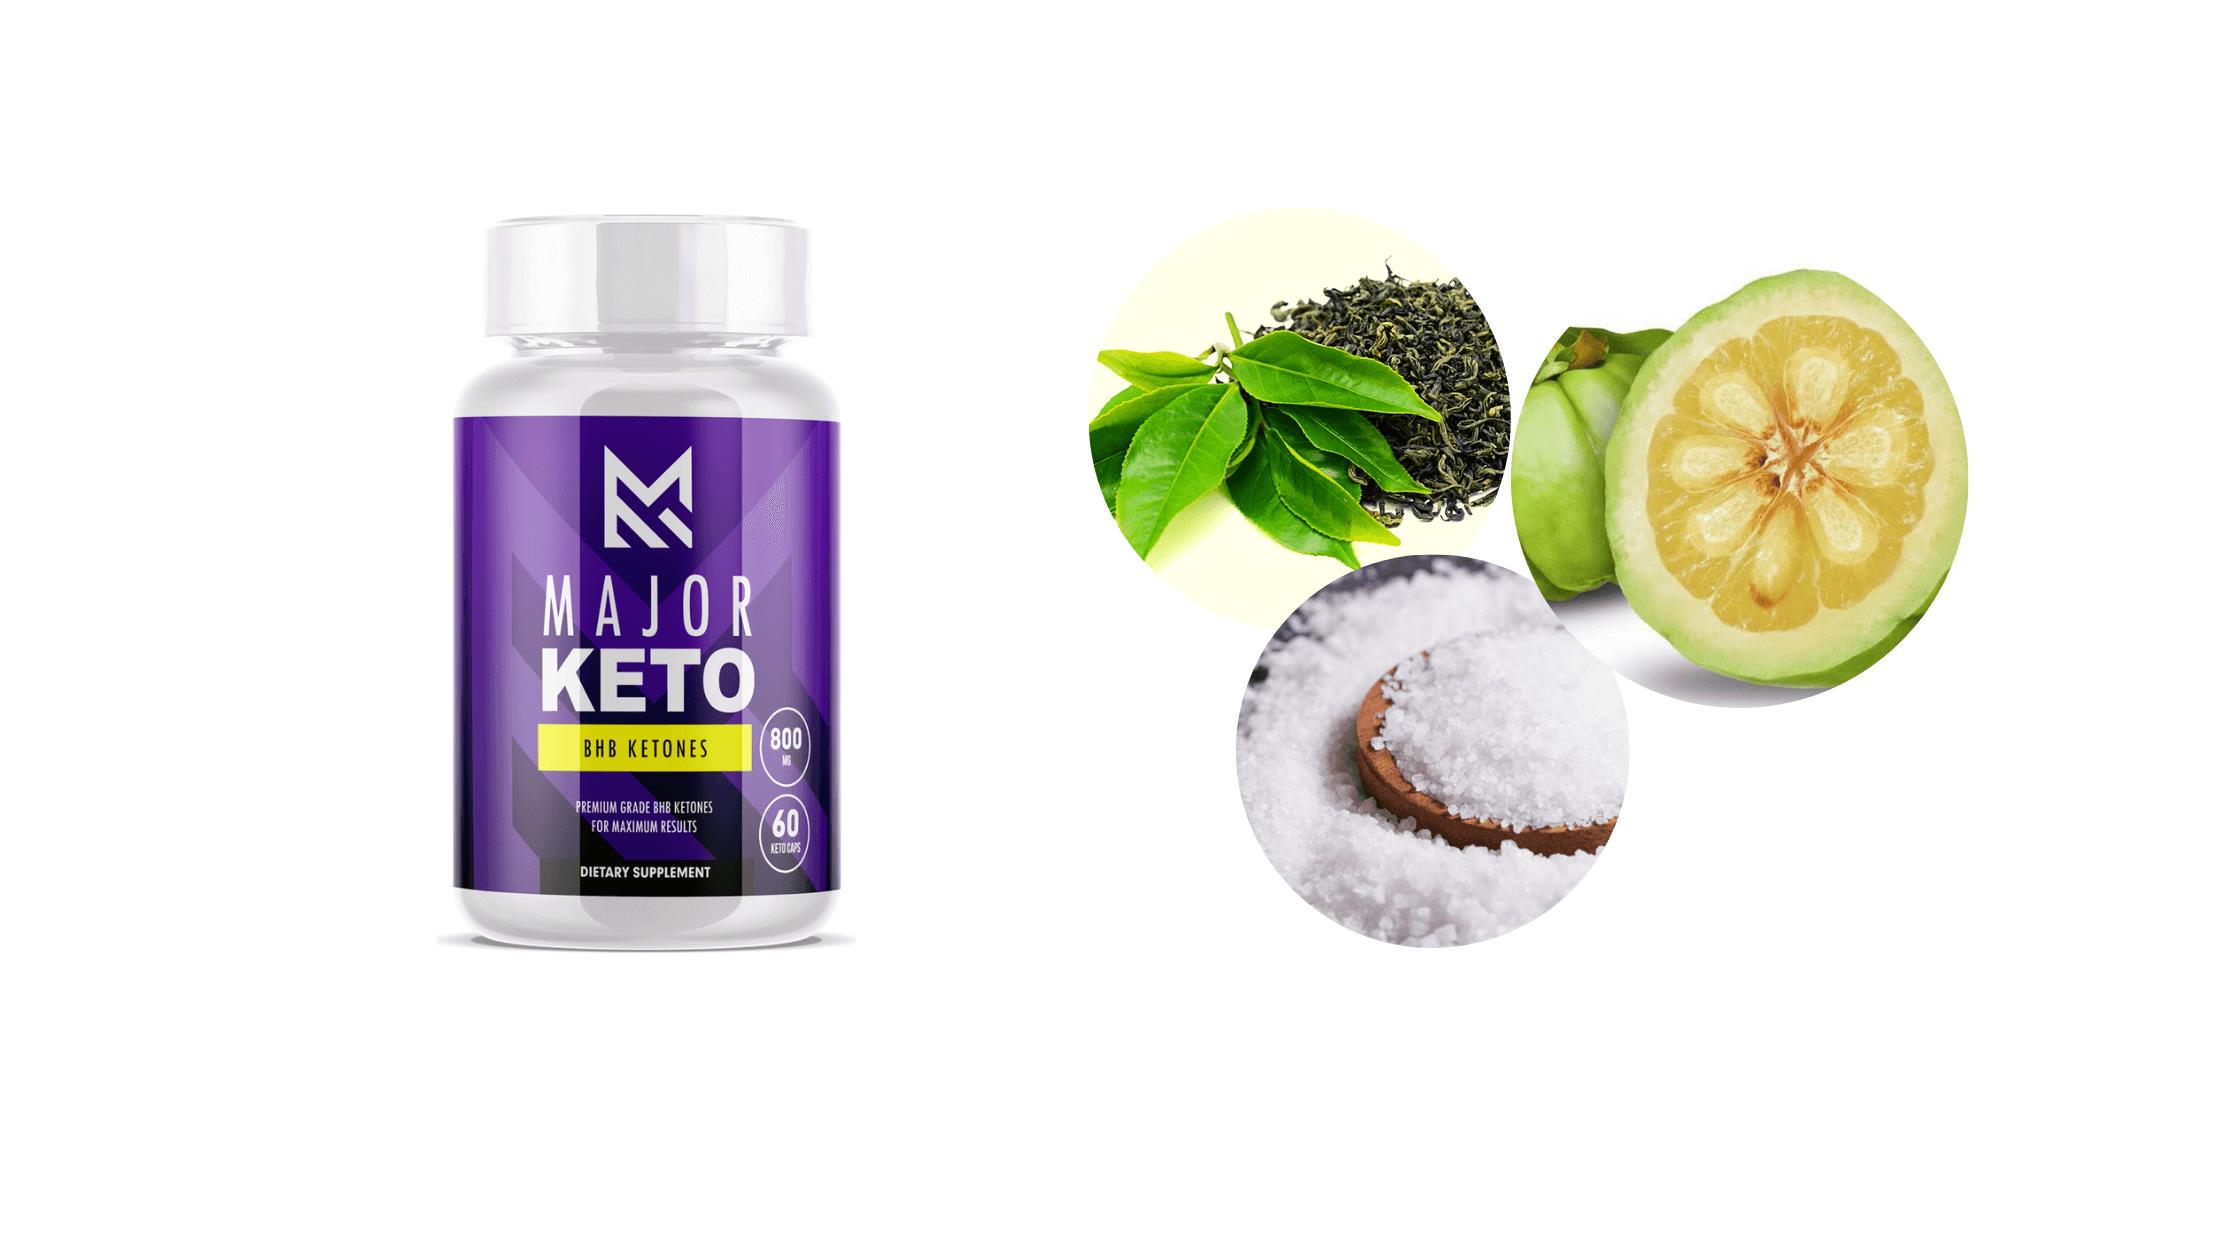 Major Keto solution ingredients